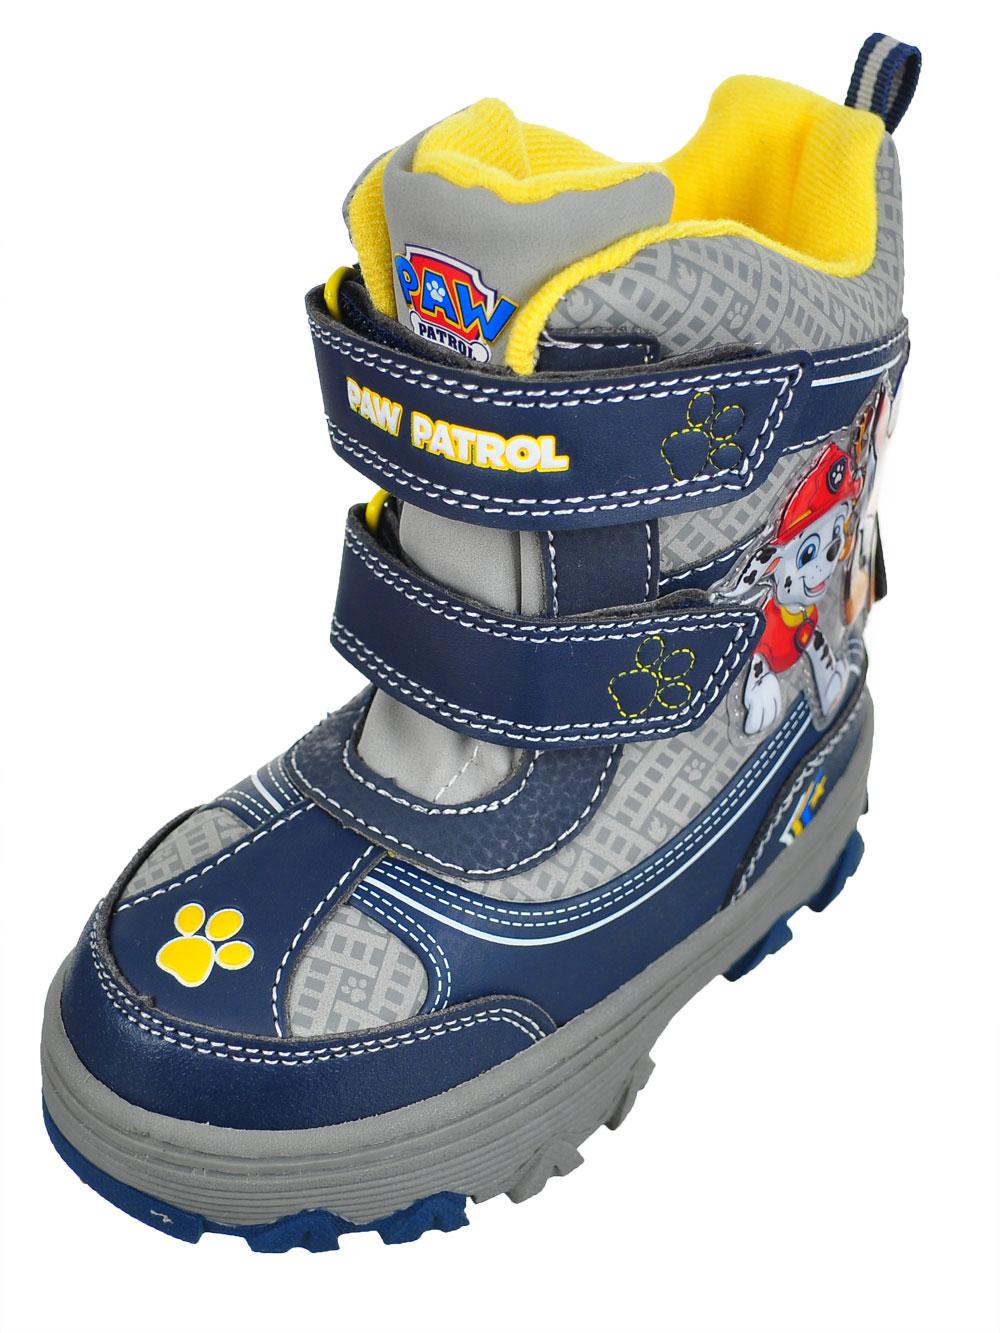 293415d36 Paw Patrol Boys' Winter Boots (Sizes 7 – 12)